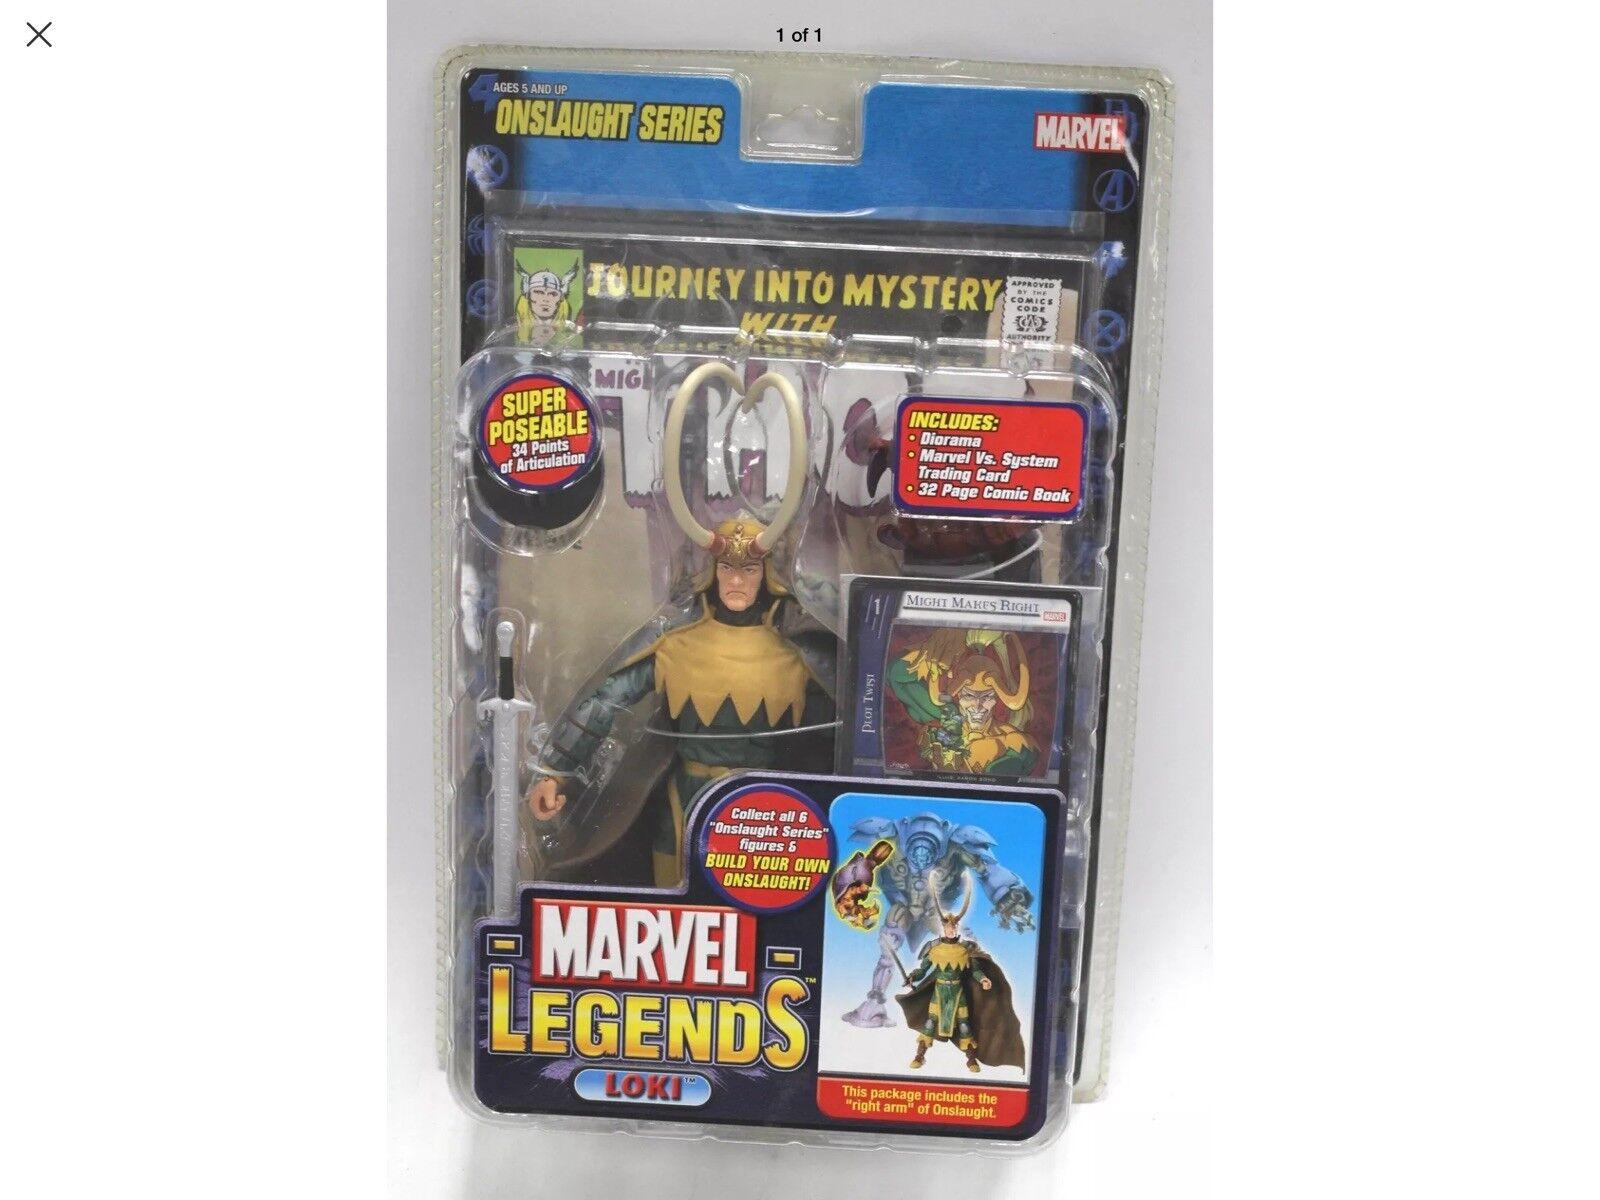 Marvel - legenden ansturm baf - reihe, loki (kurze horn variante) action - figur